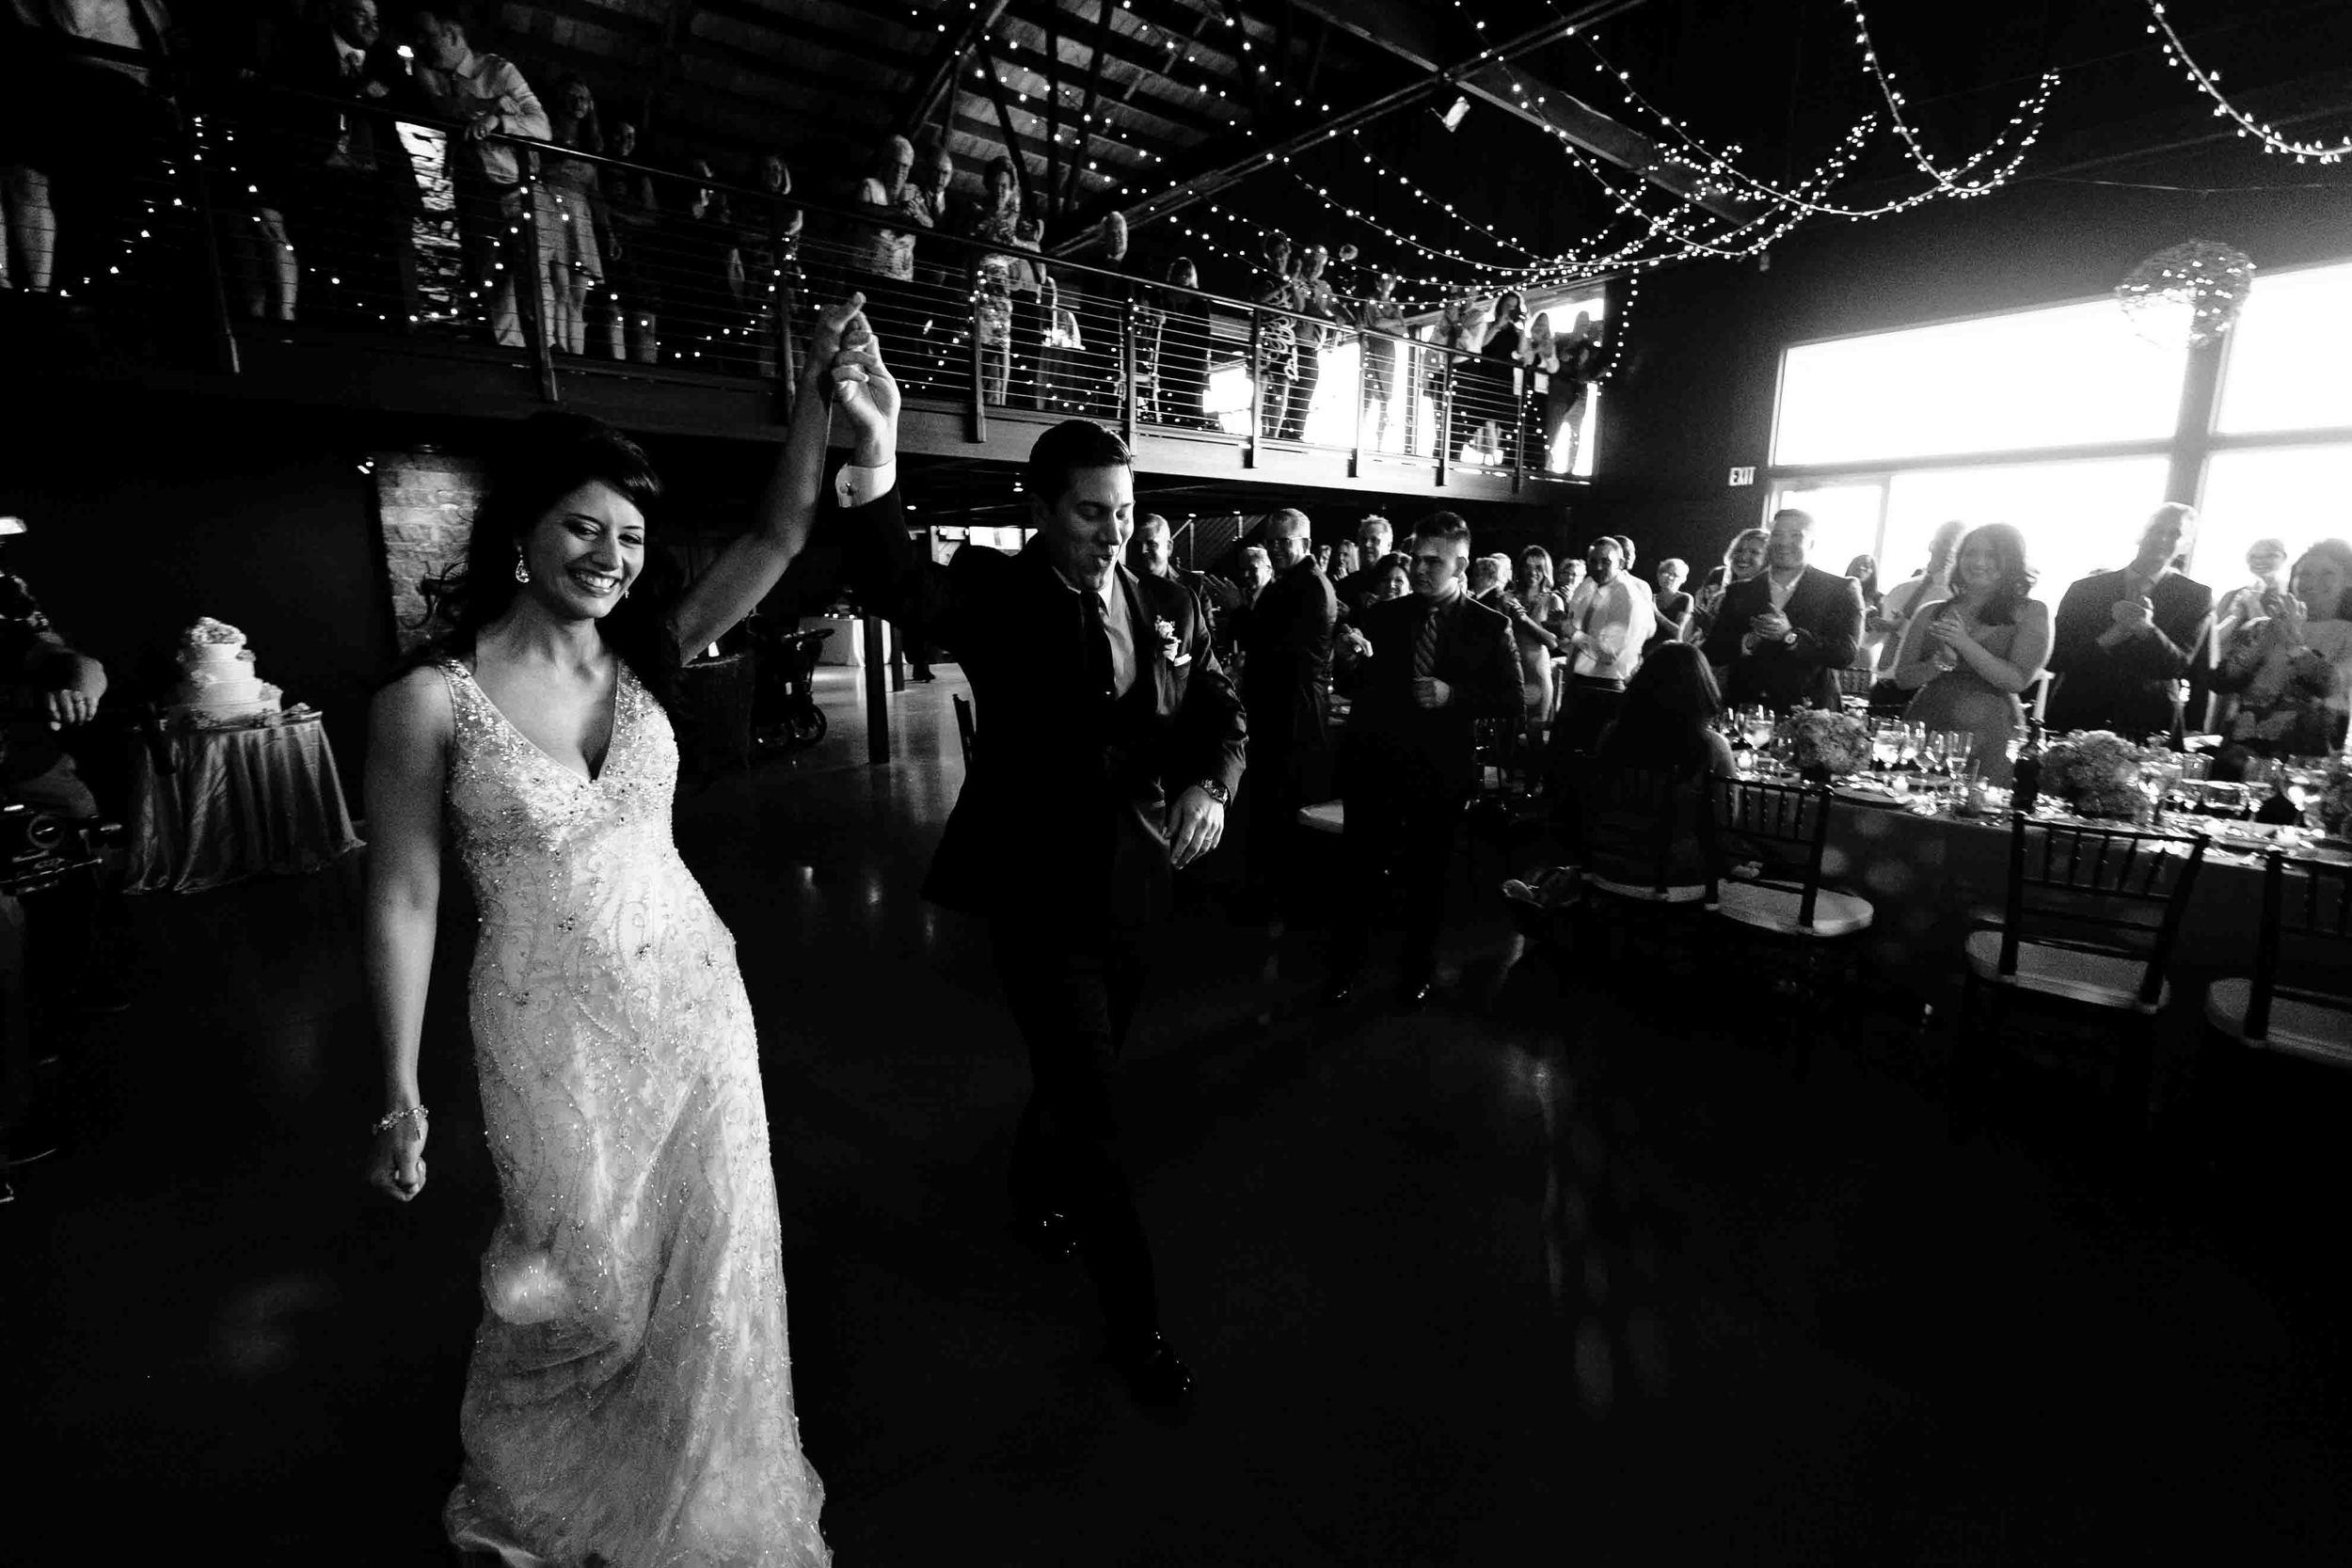 Affordable Wedding Photography Connecticut Jacek Dolata www.jacekdolata.com 860-689-6670